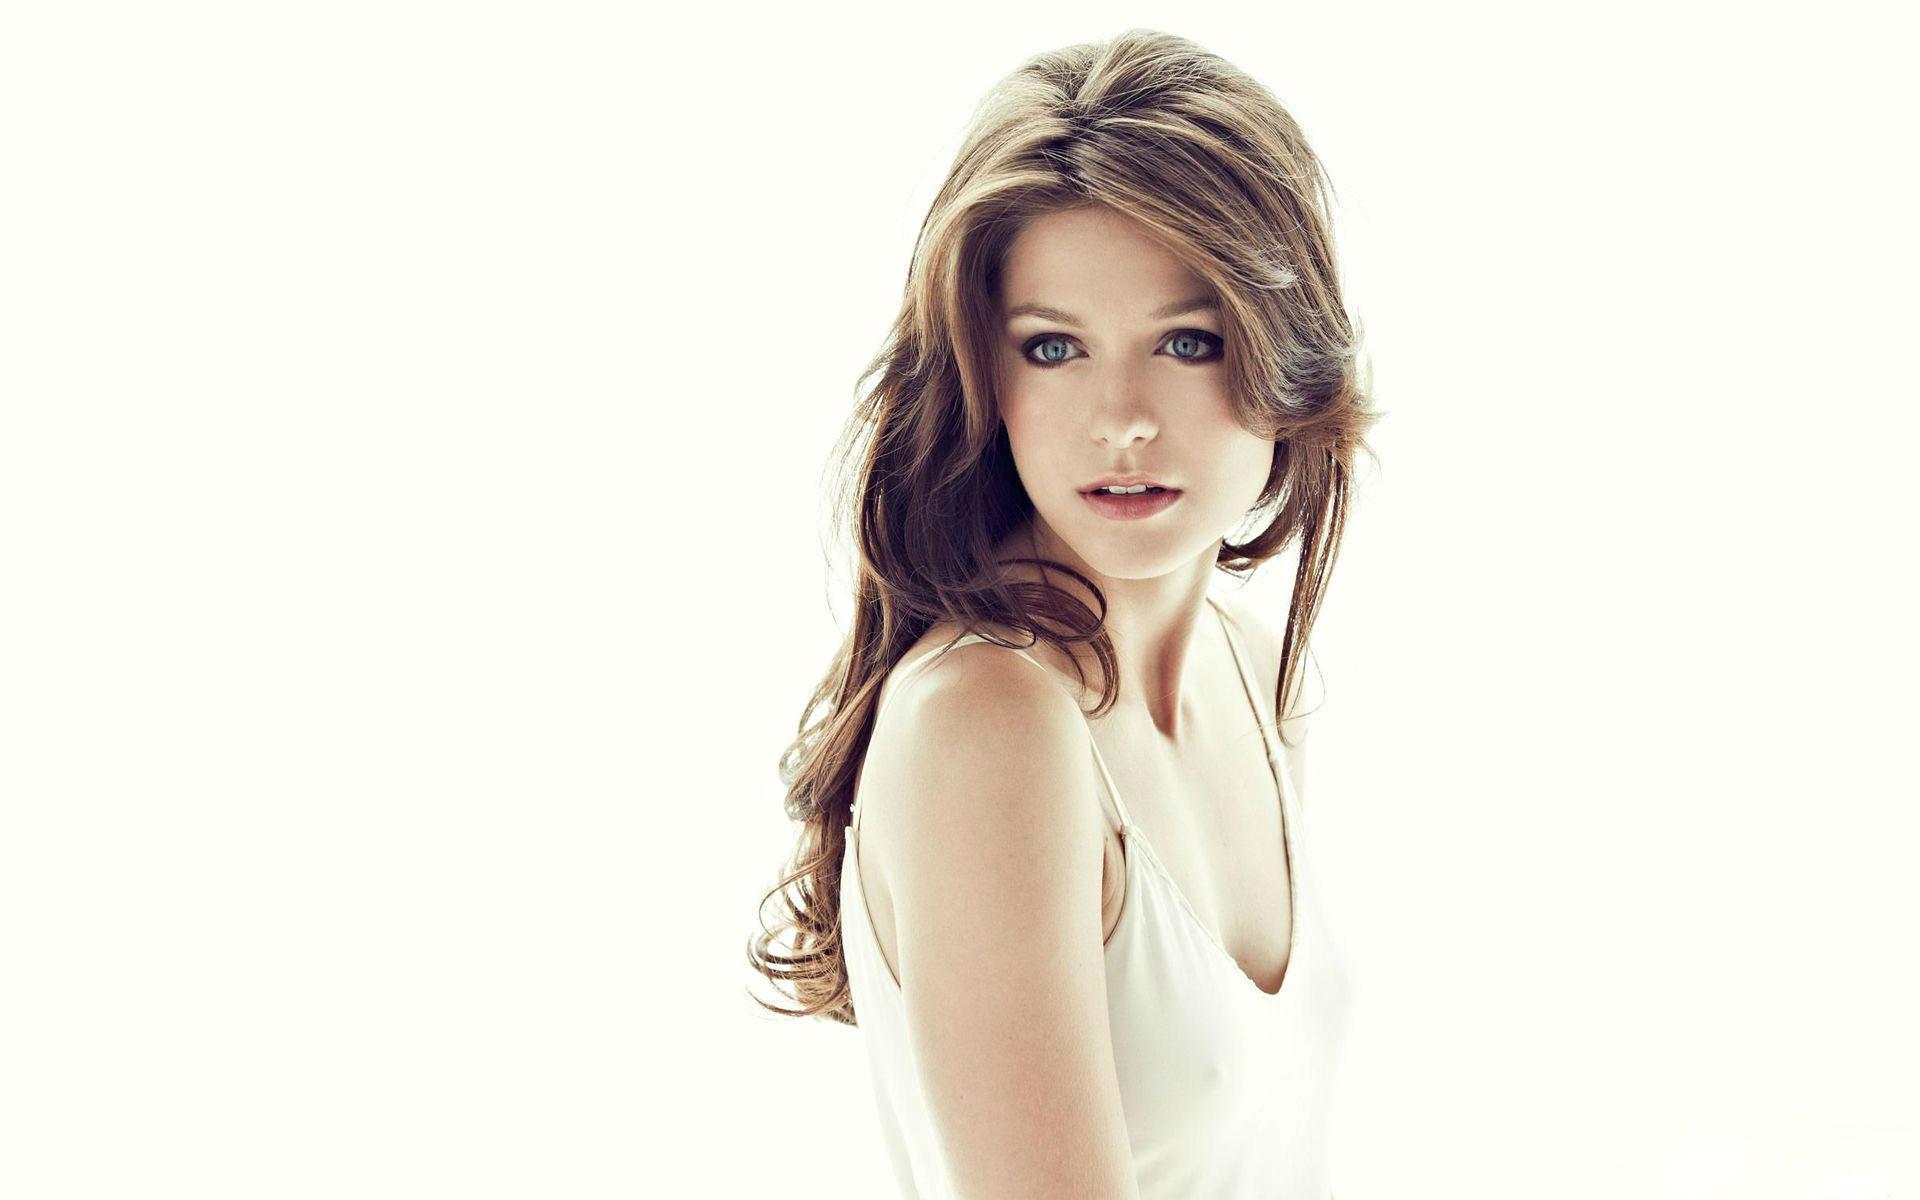 melissa benoist actress desktop wallpaper 61097